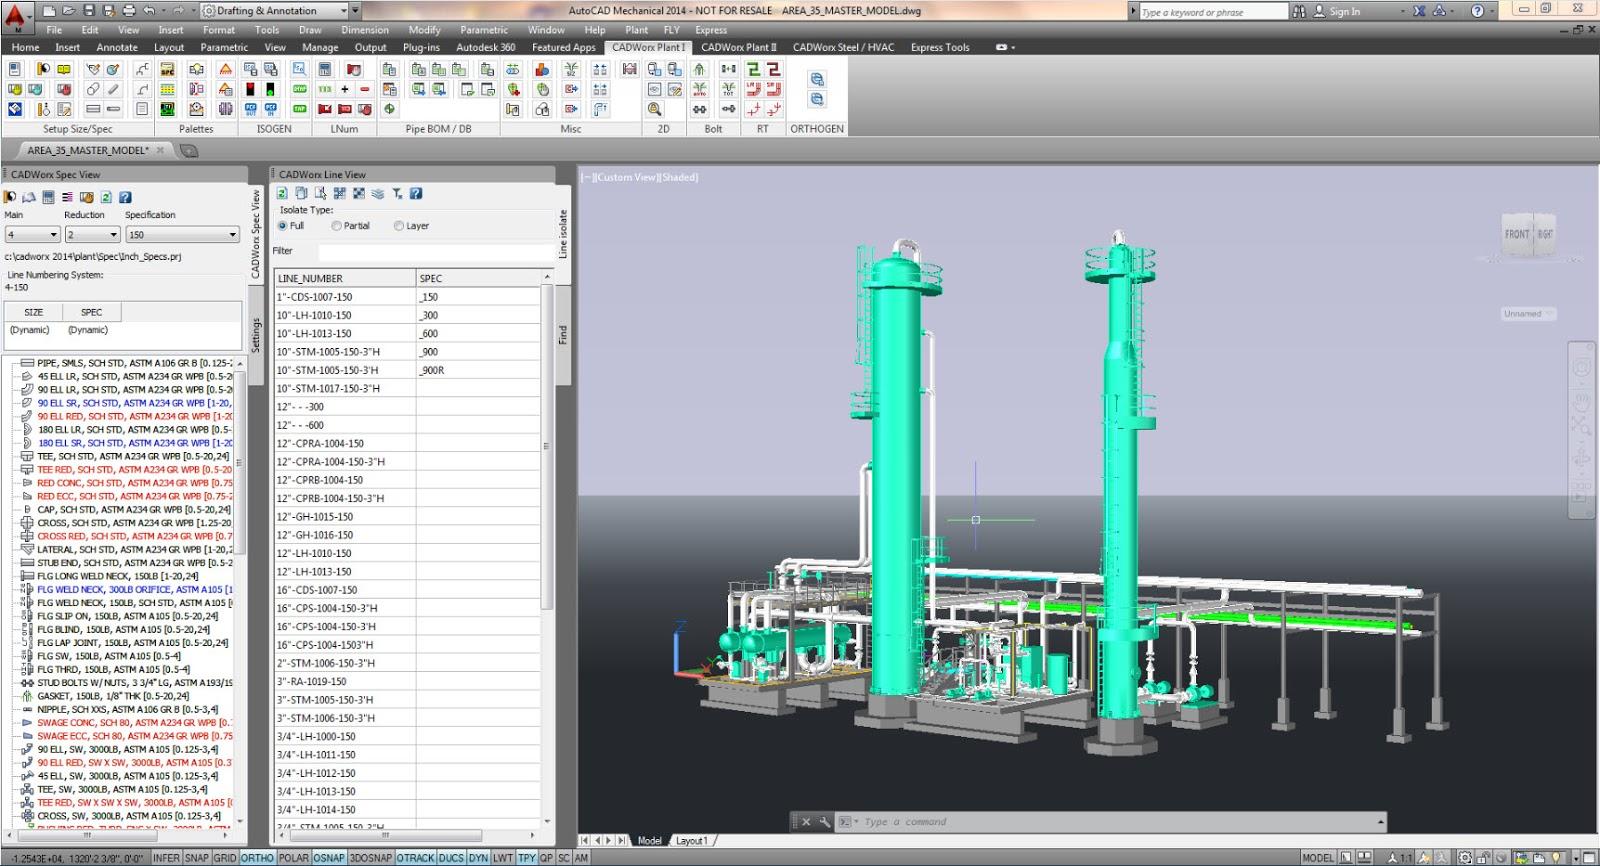 chempute software cadworx 2014 release rh chemputesoftware blogspot com CADWorx 2014 Tips CADWorx Plant Professional 1 of 3